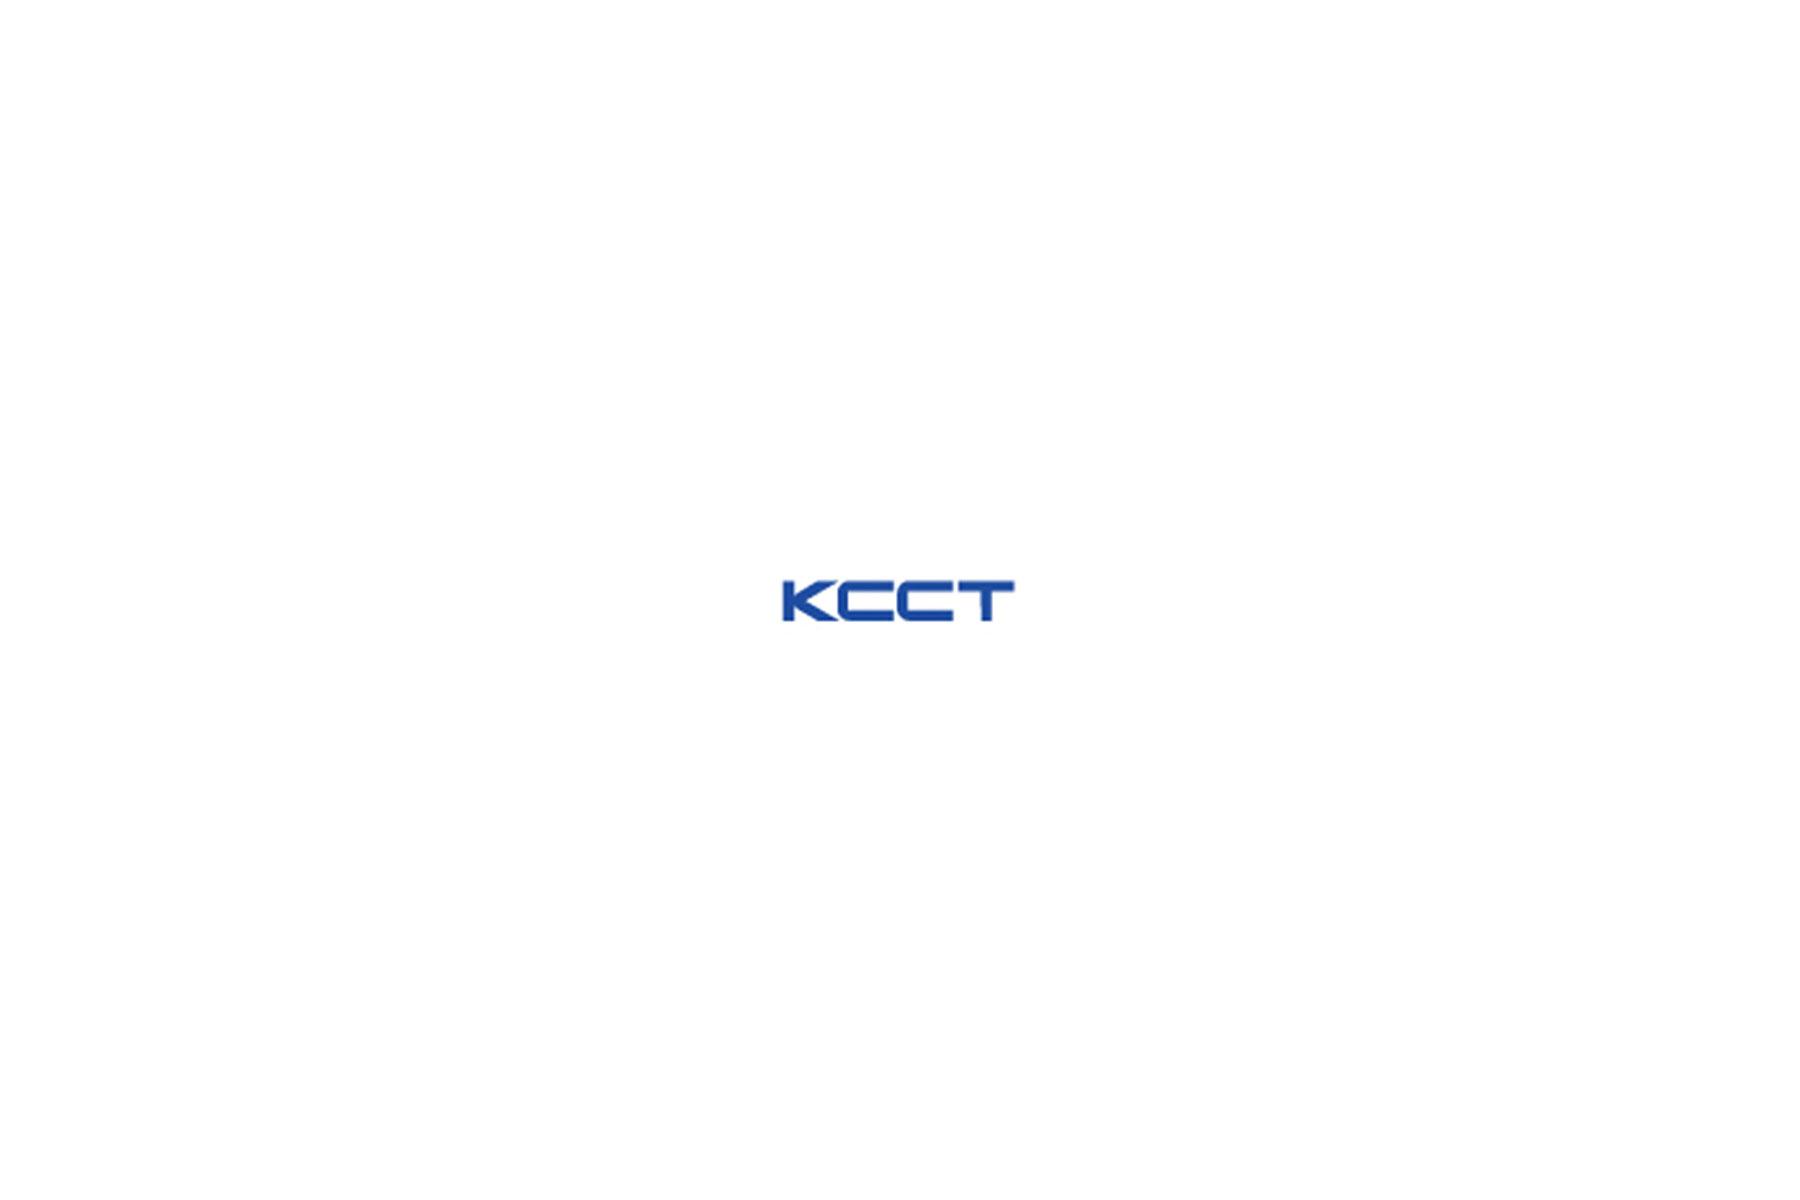 KCCSキャリアテック株式会社のトップ画像